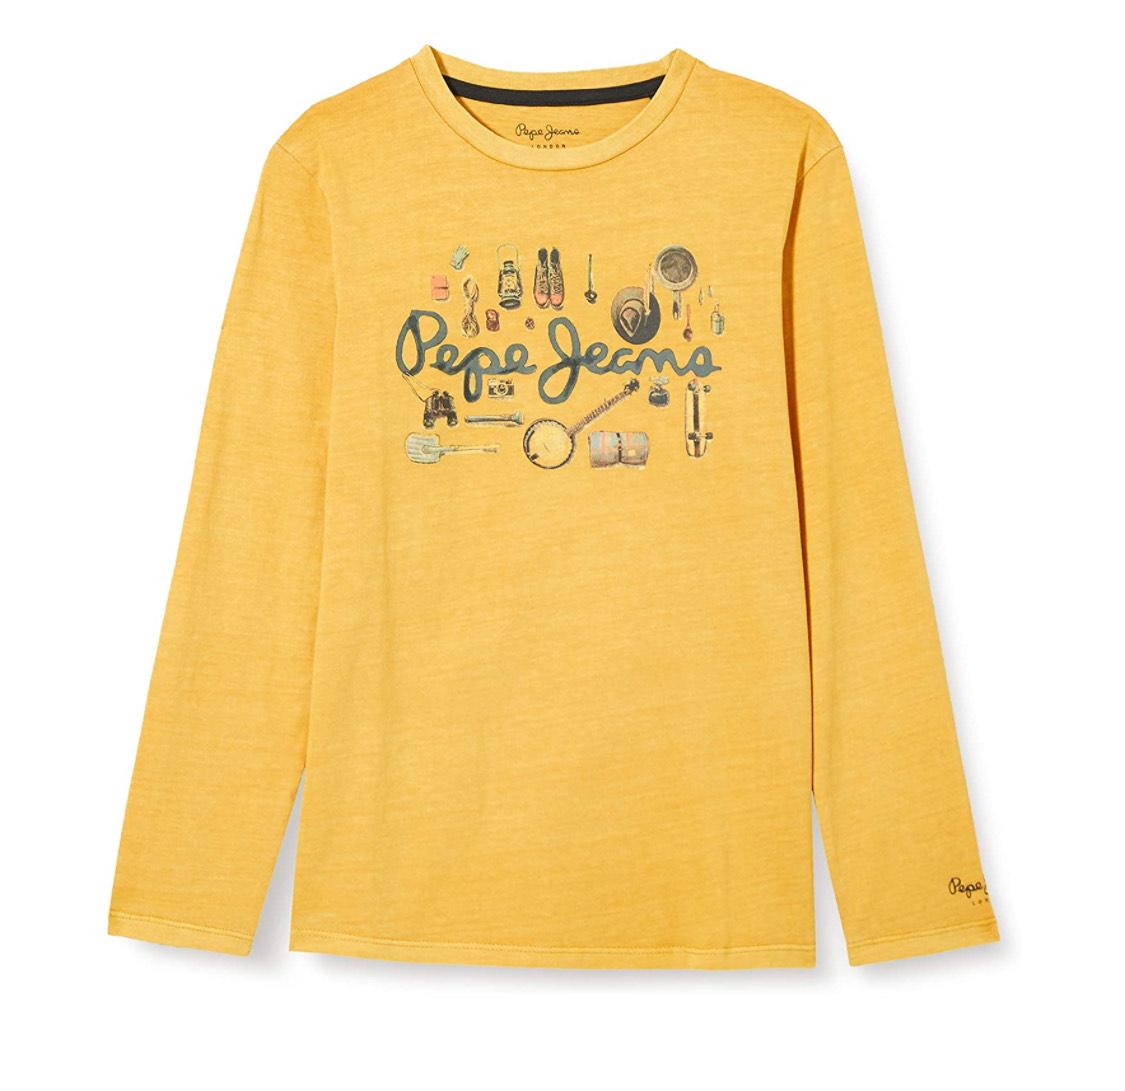 Camiseta infantil Pepe Jeans manga larga talla 6.